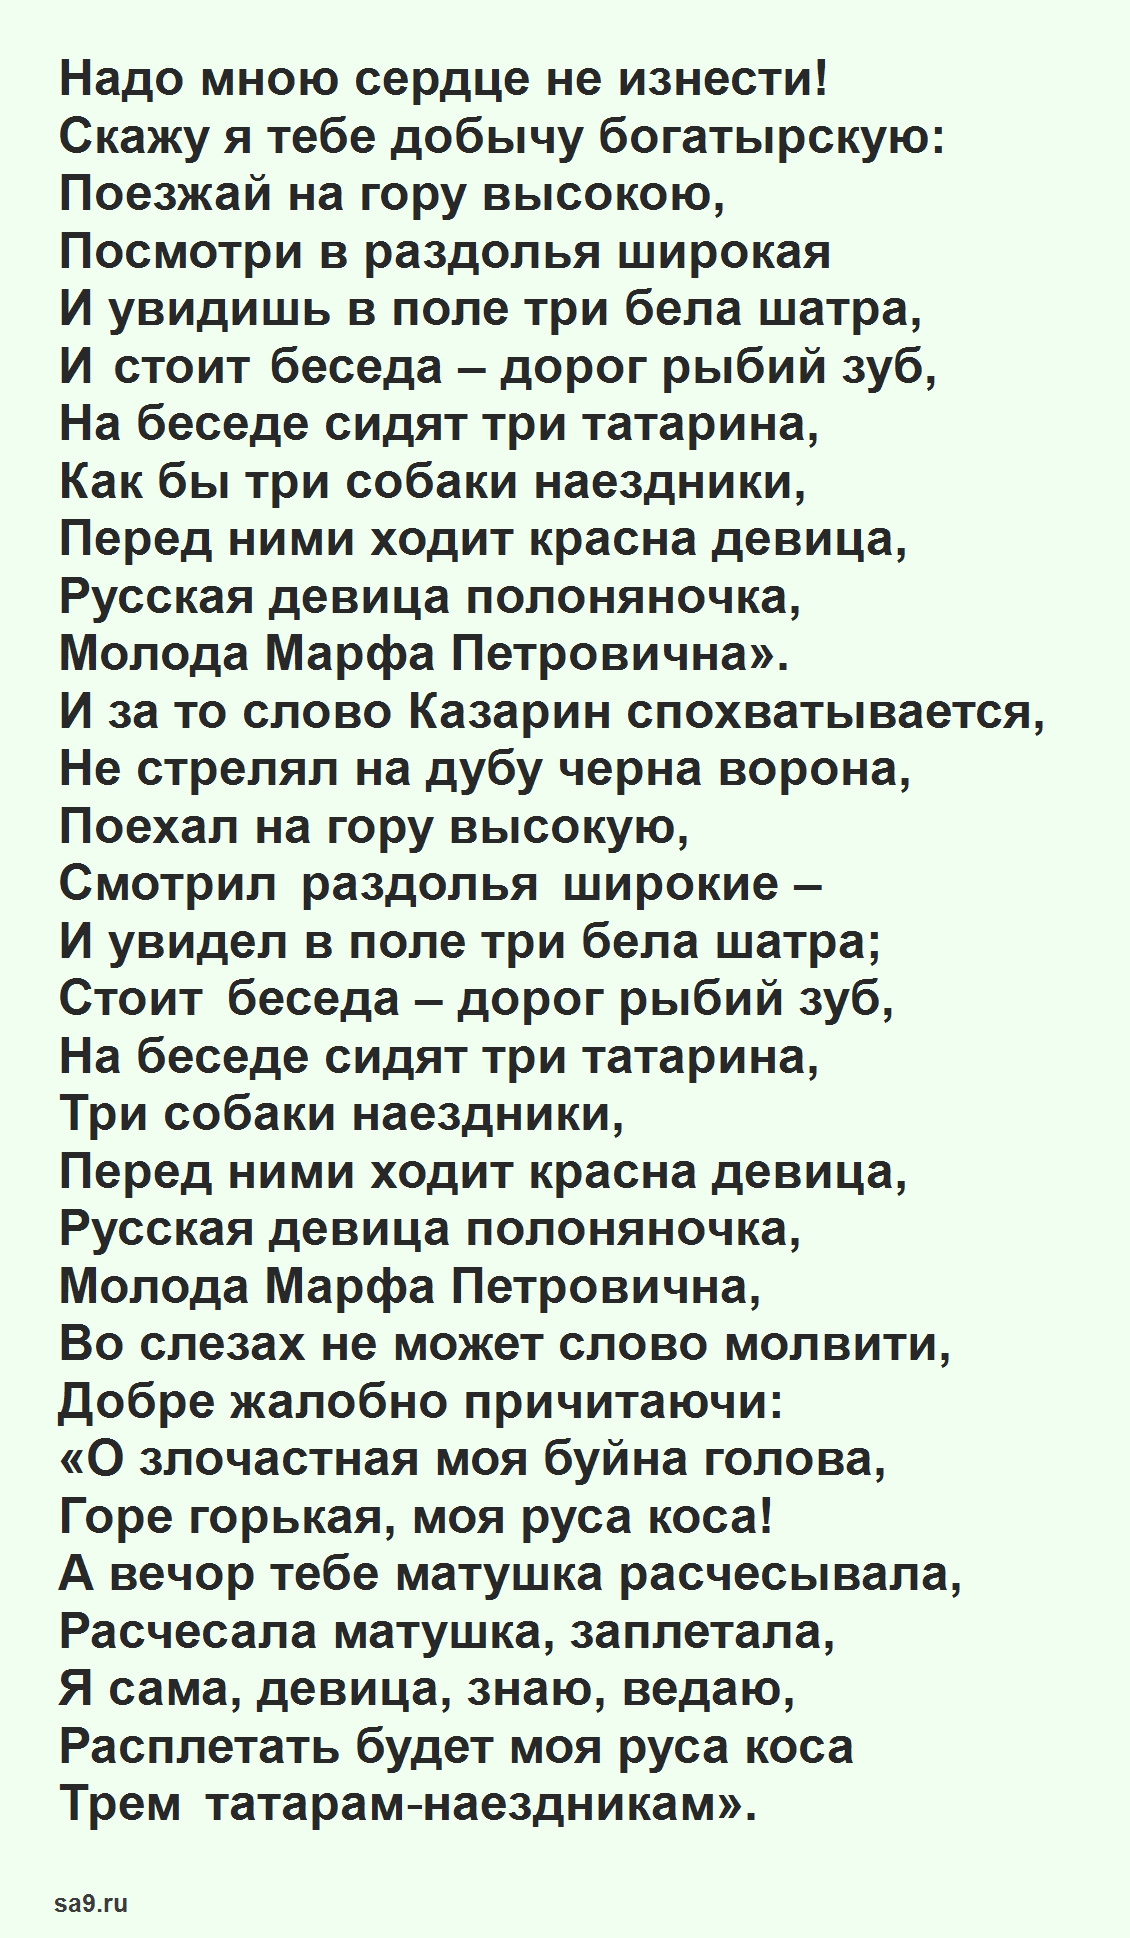 Былина - Михайло Казаренин